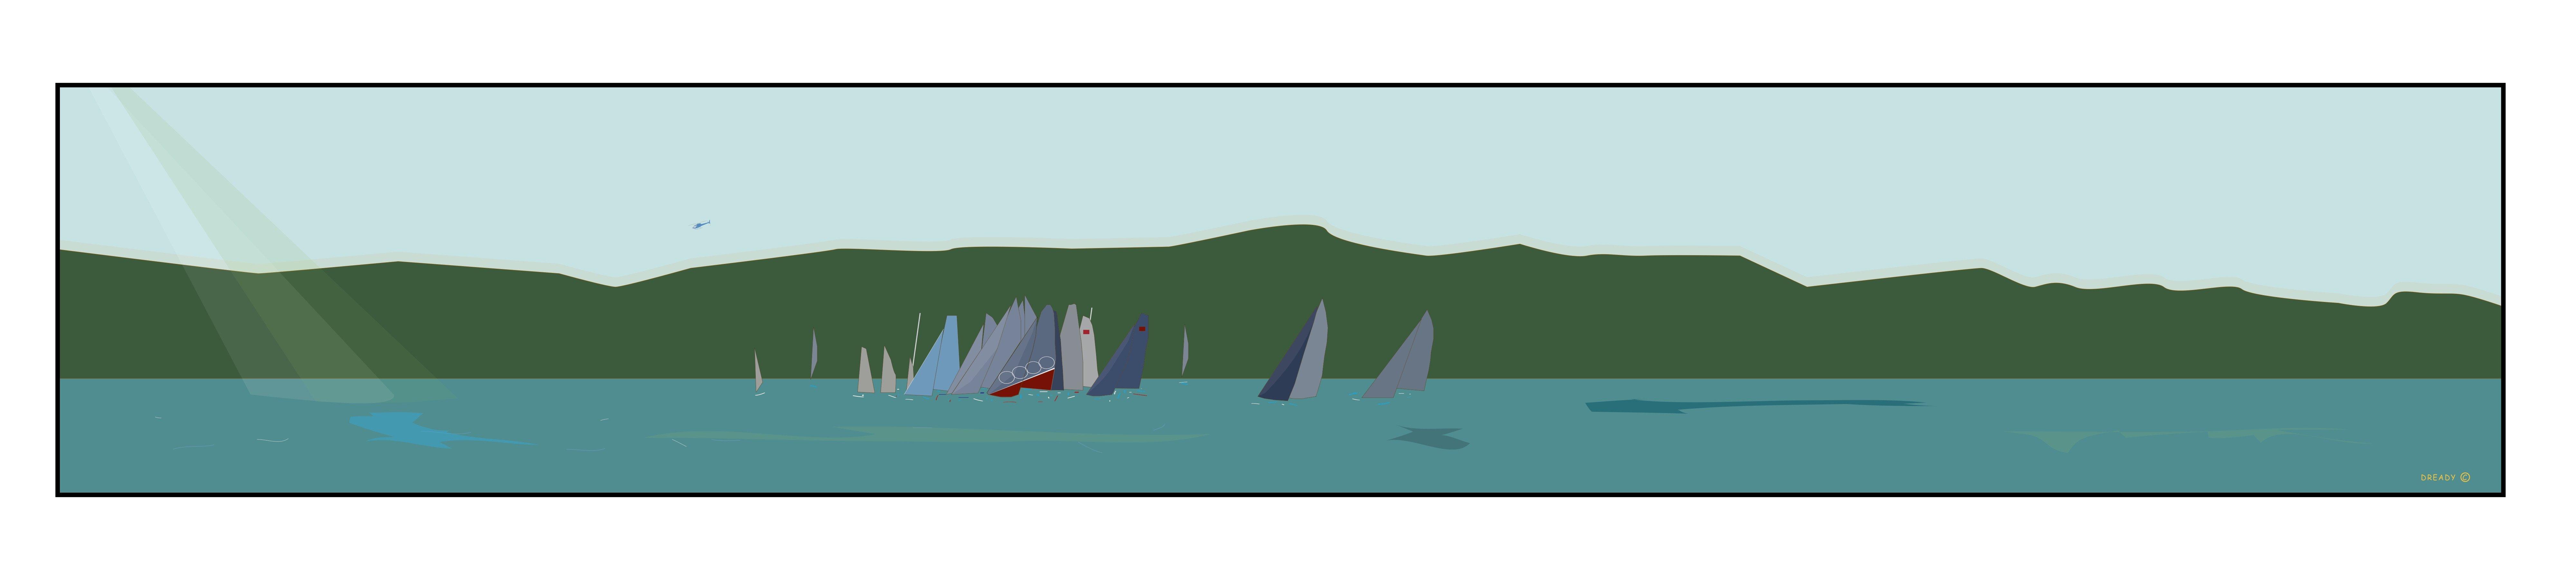 Sailing race start